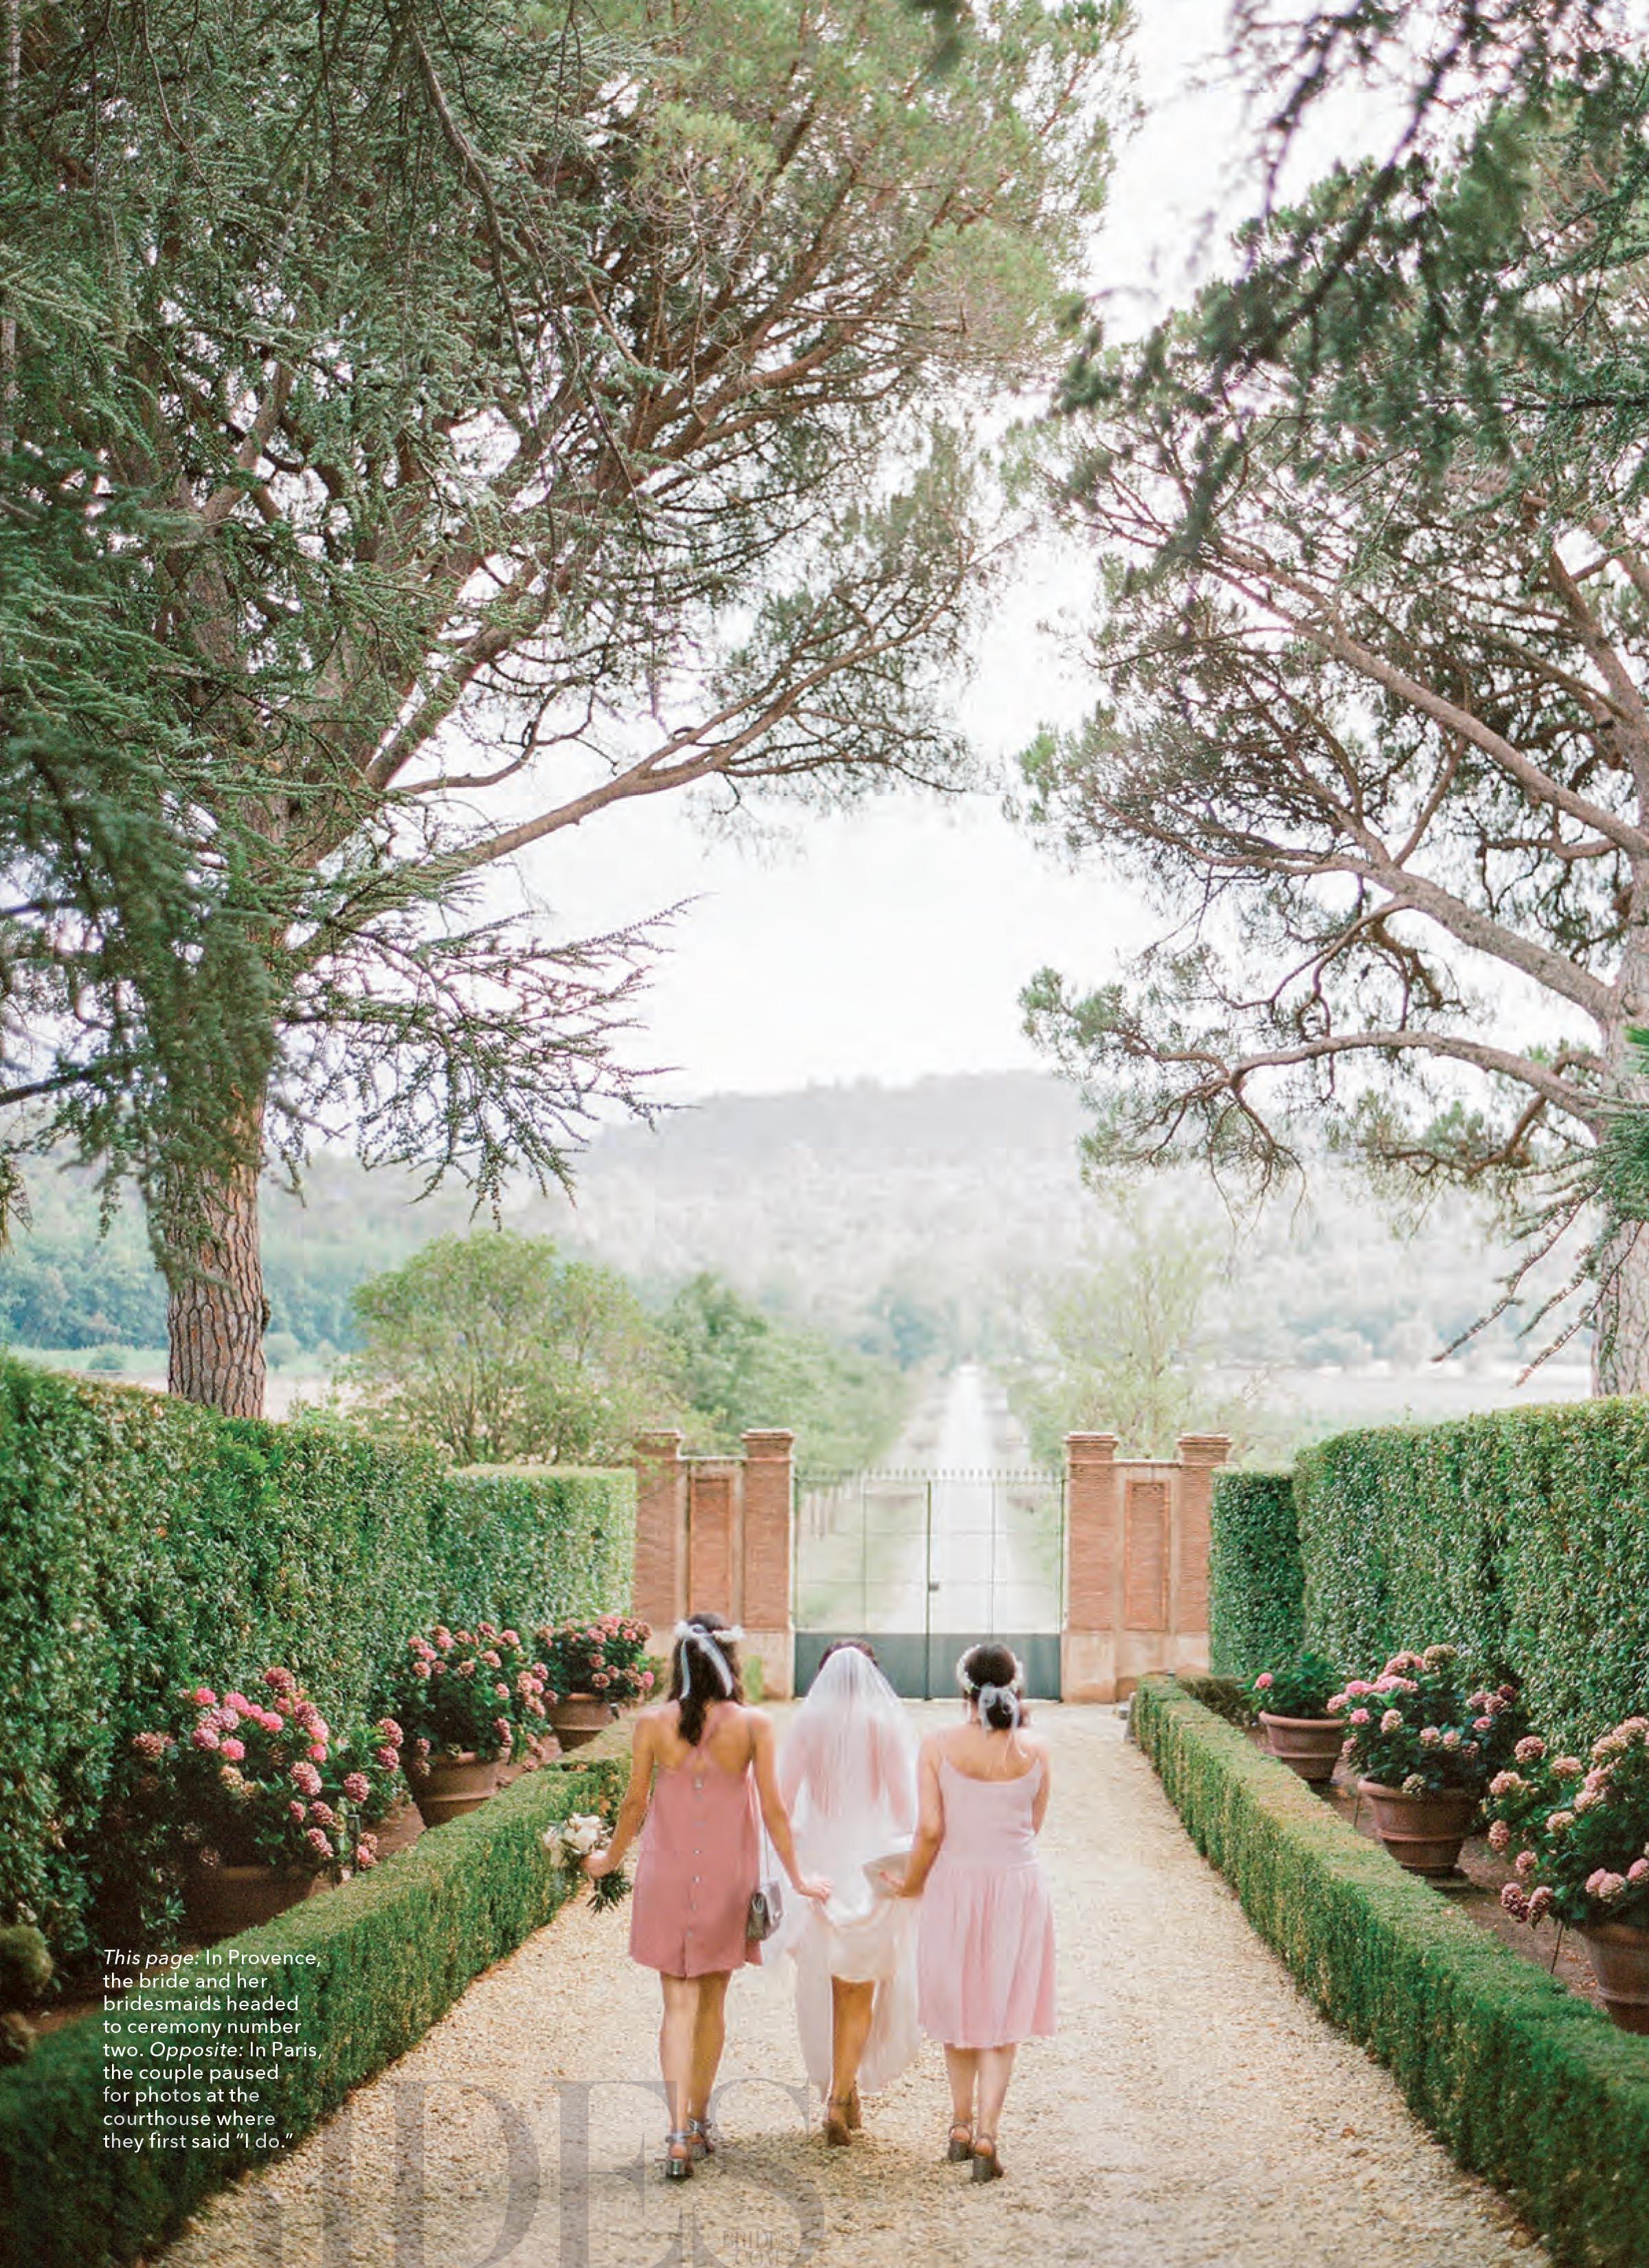 Sylvie-Gil-destination-film-wedding-photography-brides-amelie-laurent